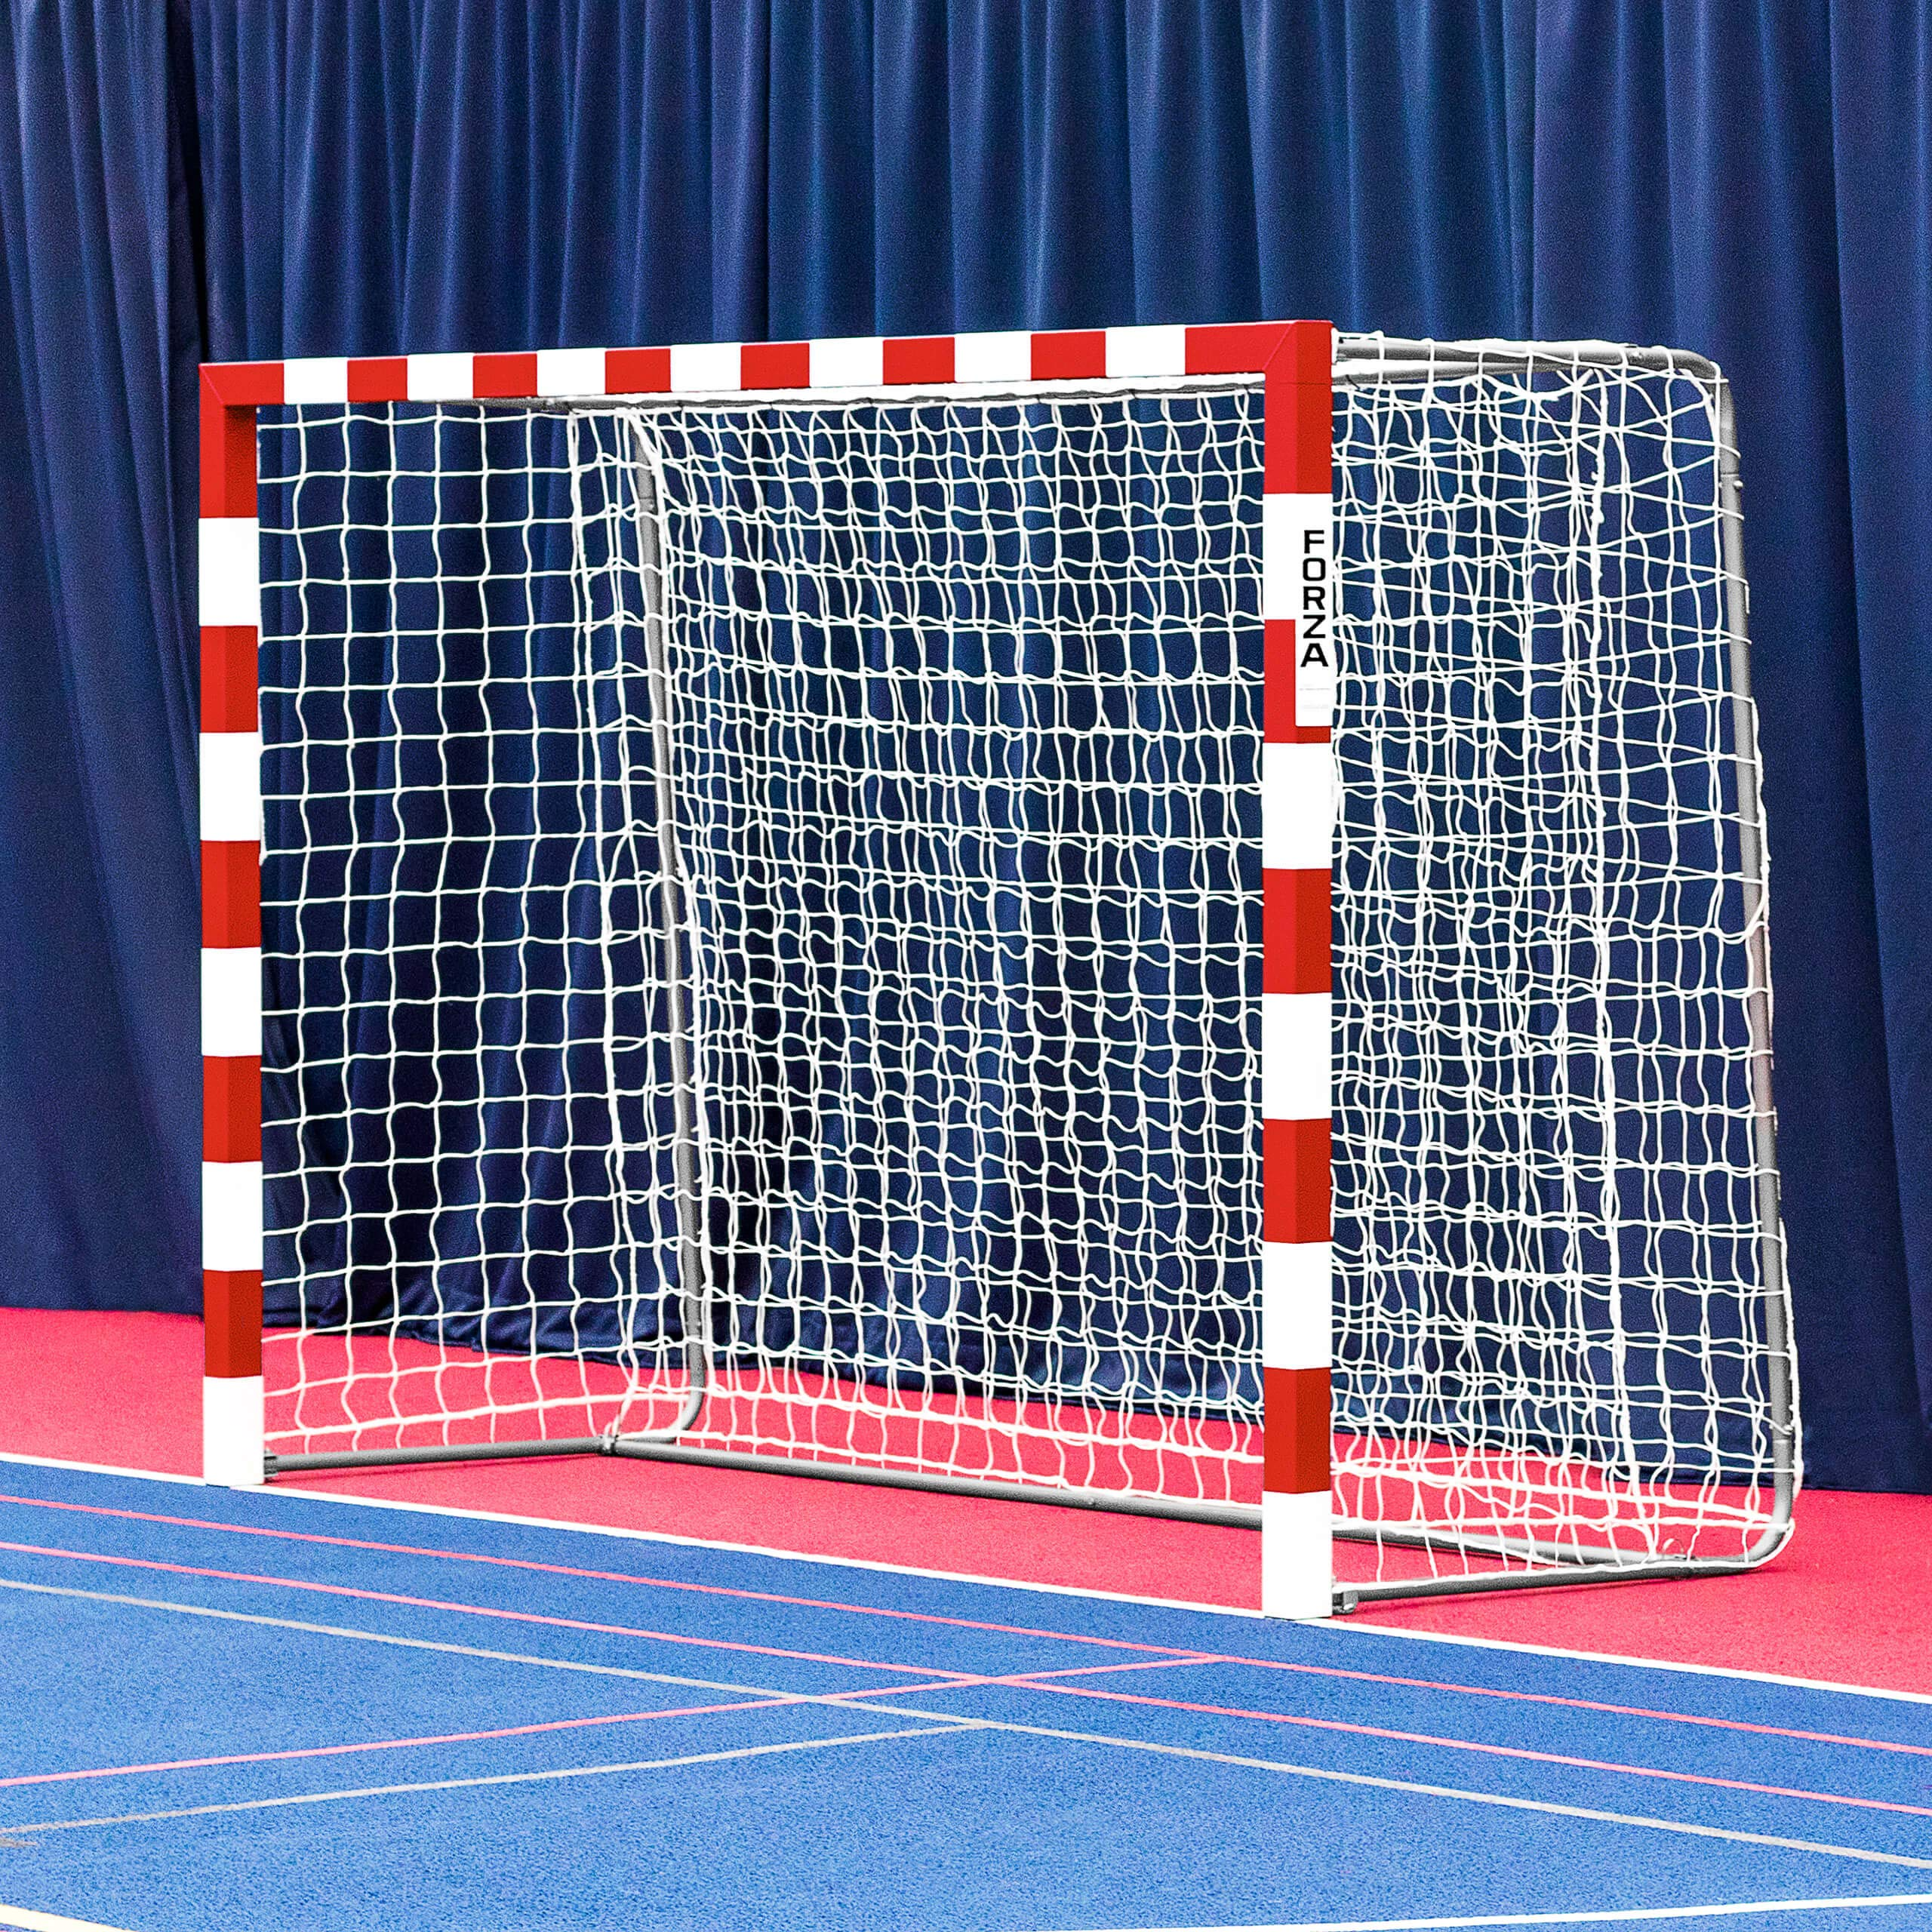 Forza Alu80 Competition Handball Goals | IHF Regulation Size 3m x 2m Handball Goal [Net World Sports] (Pair, Red) by Forza (Image #9)